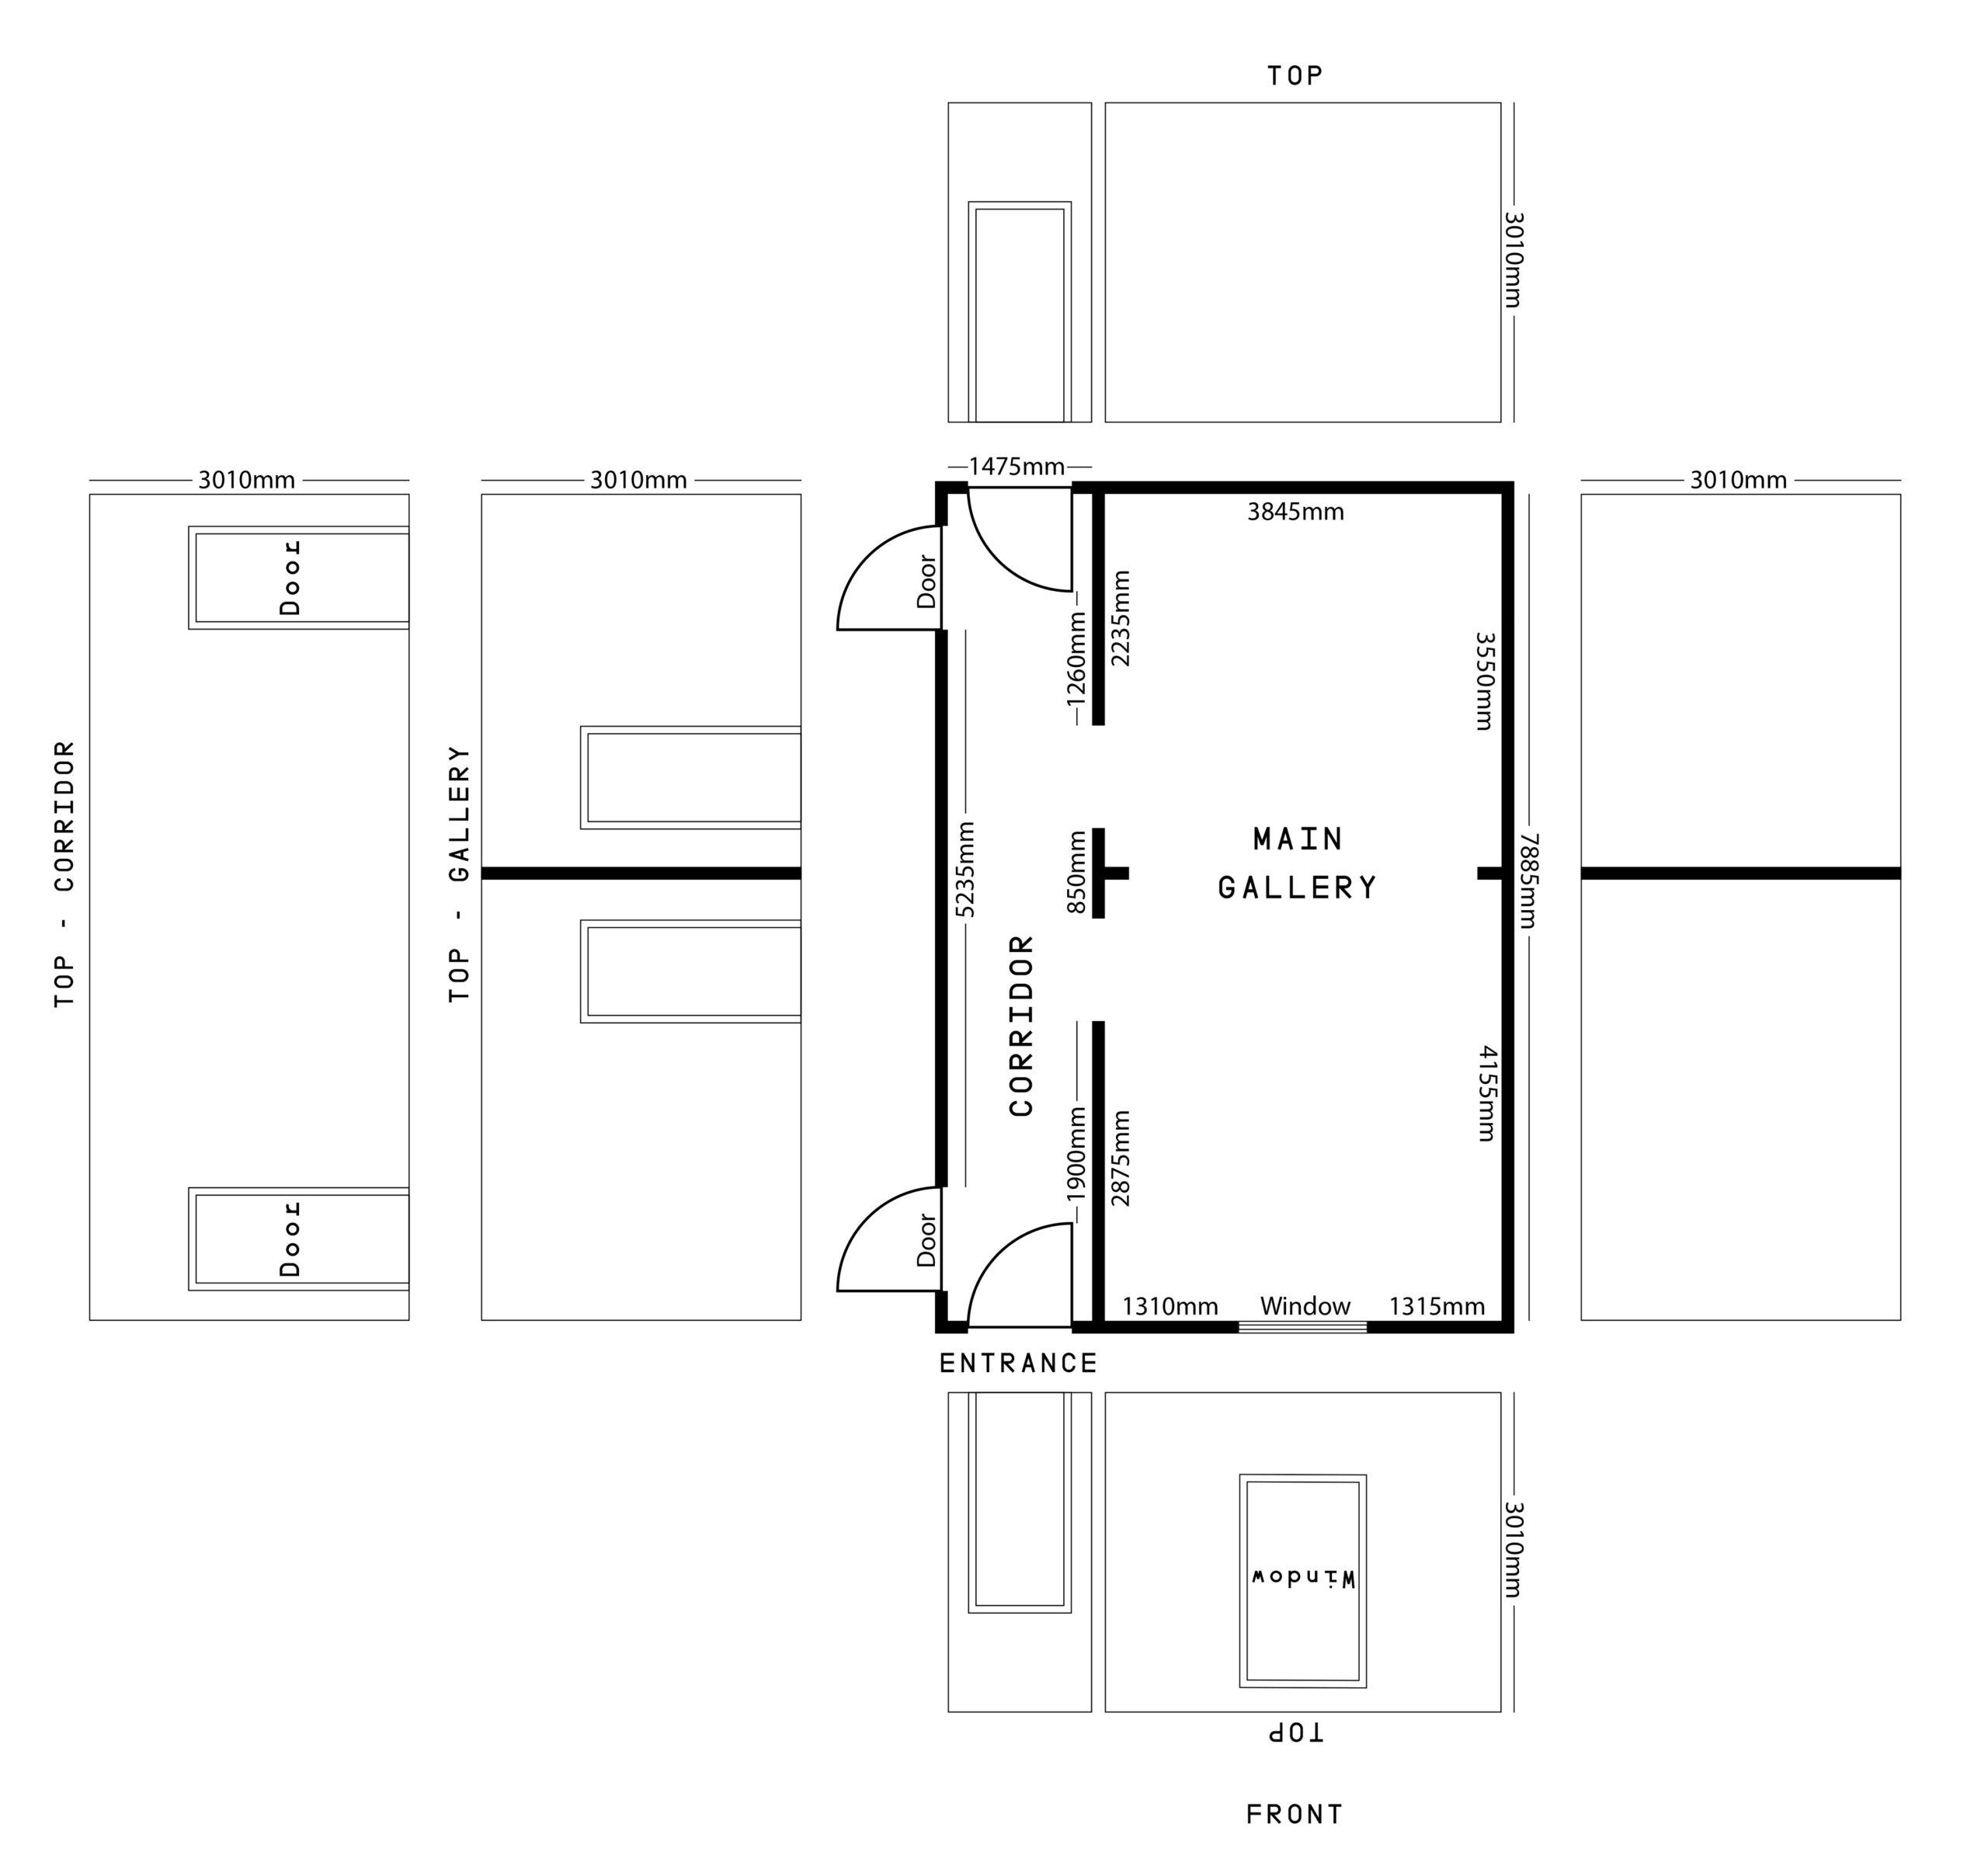 Gallery Floor Plan July 2019